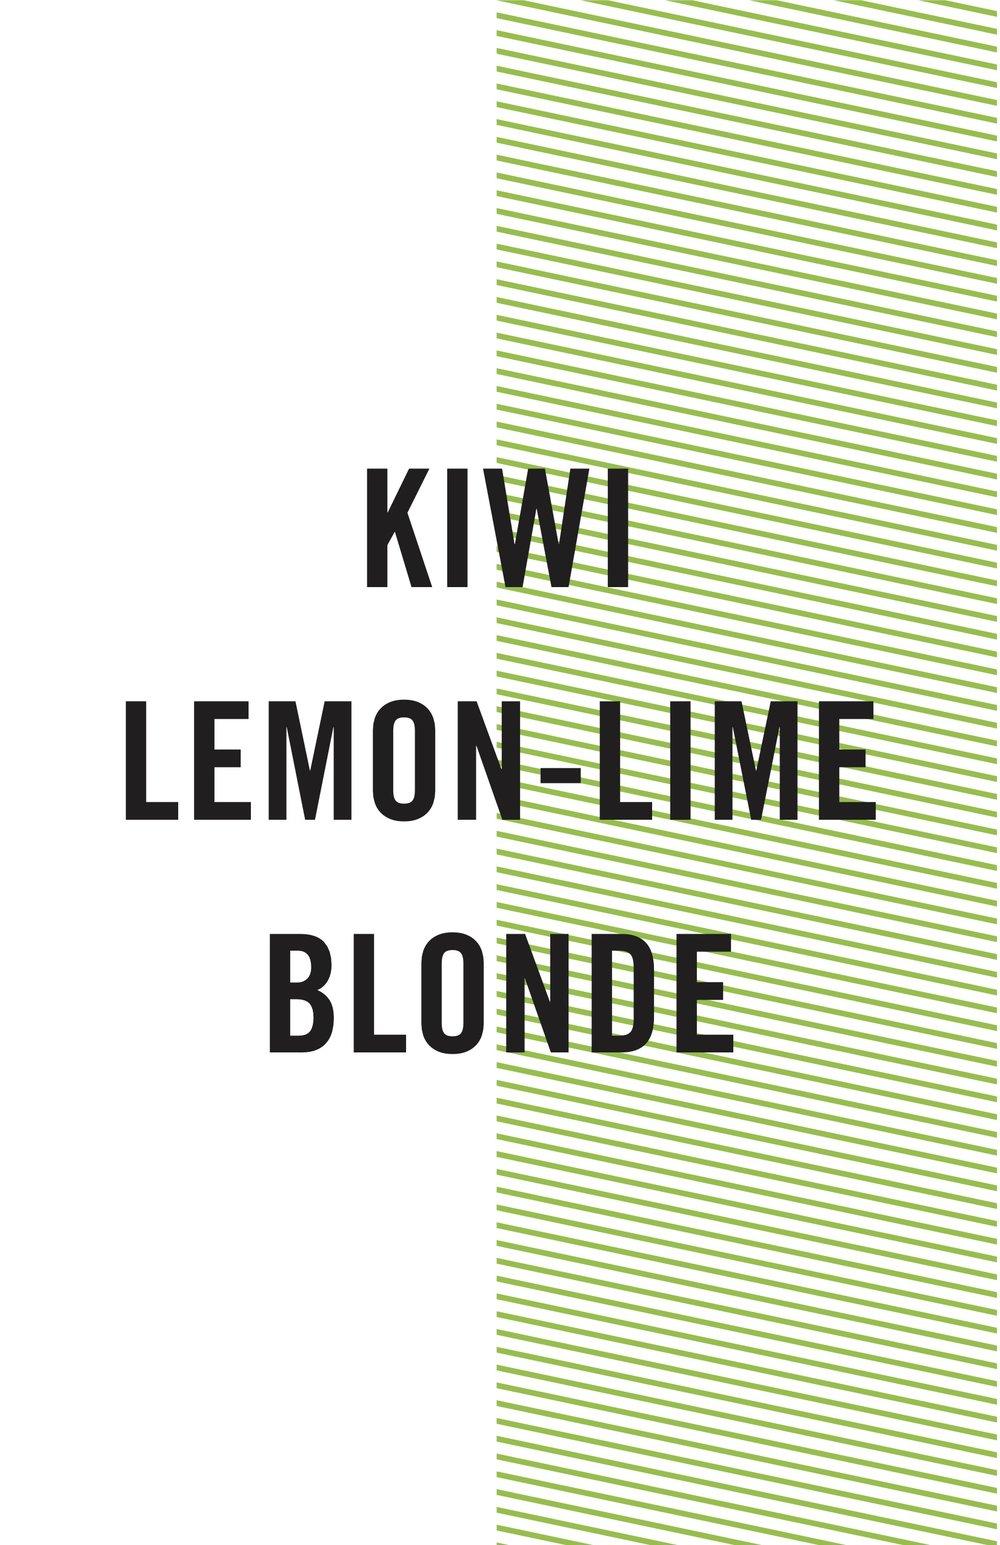 KIWI LEMON LIME BLONDE.jpg